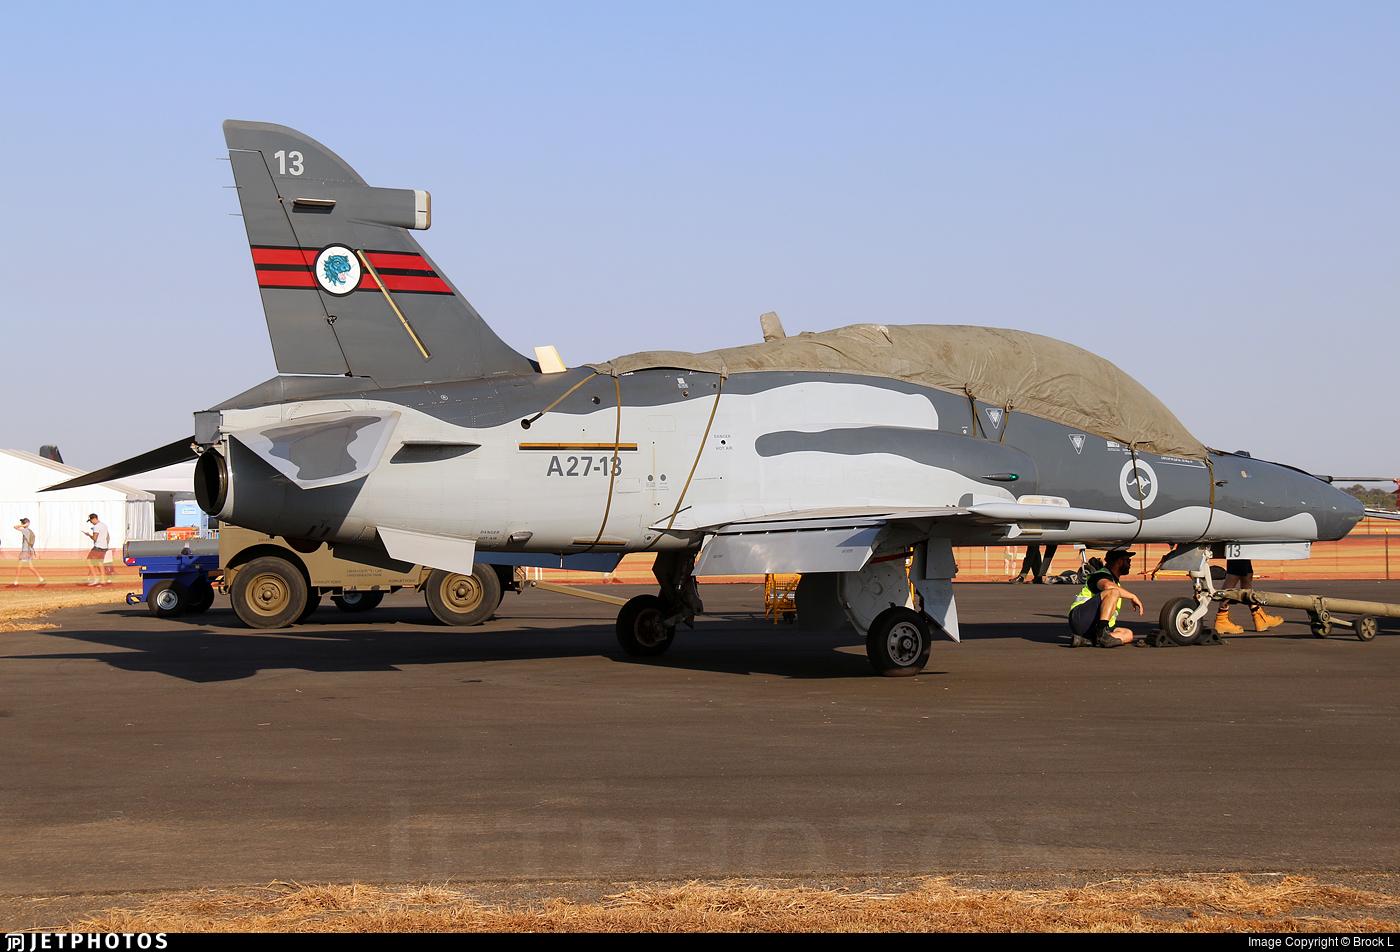 A27-13 - British Aerospace Hawk Mk.127 Lead-In Fighter - Australia - Royal Australian Air Force (RAAF)